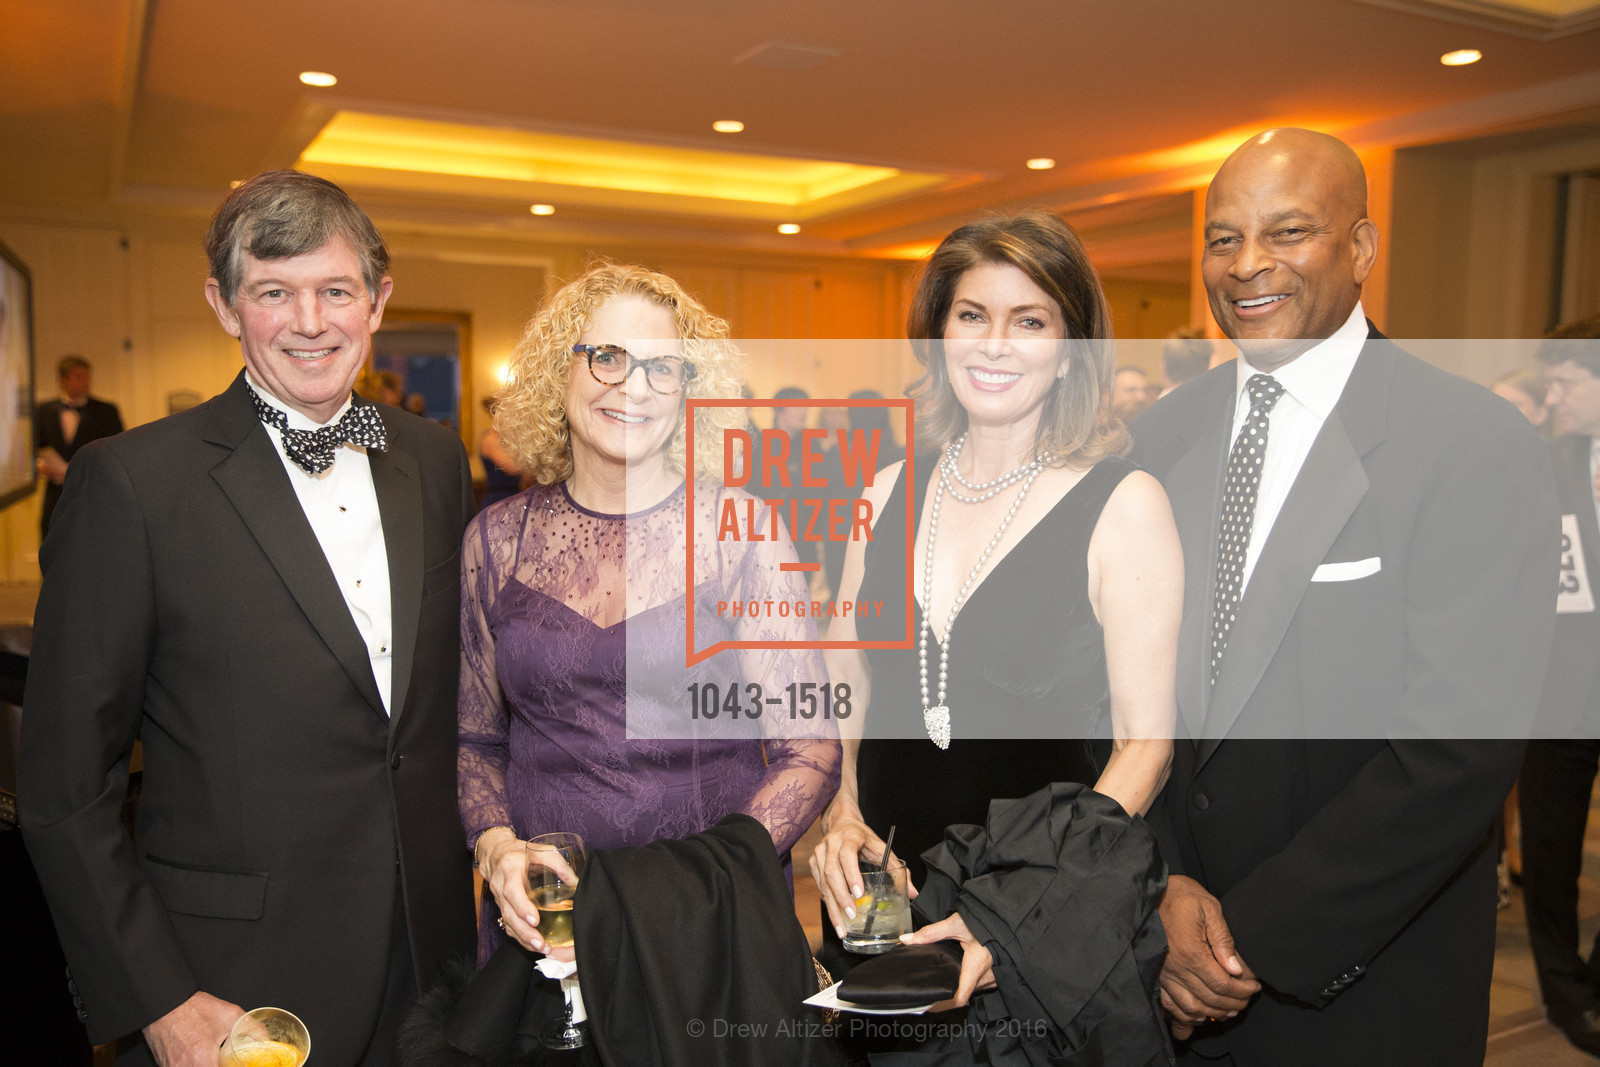 Tony Earley, Sara Earley, Karen Collmer Lott, Ronnie Lott, Photo #1043-1518